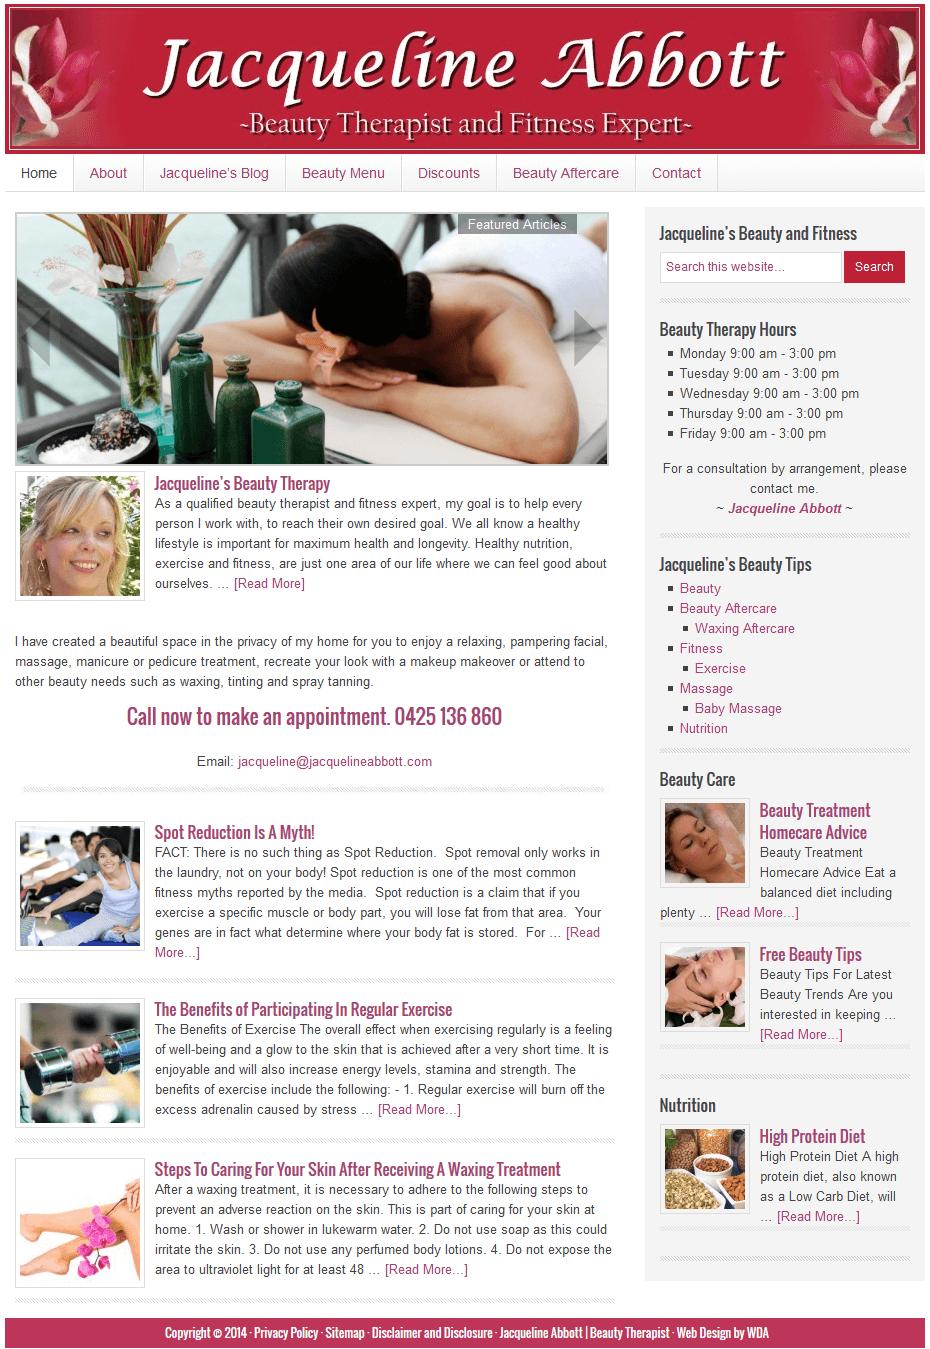 Jacqueline Abott Beauty Therapist Website